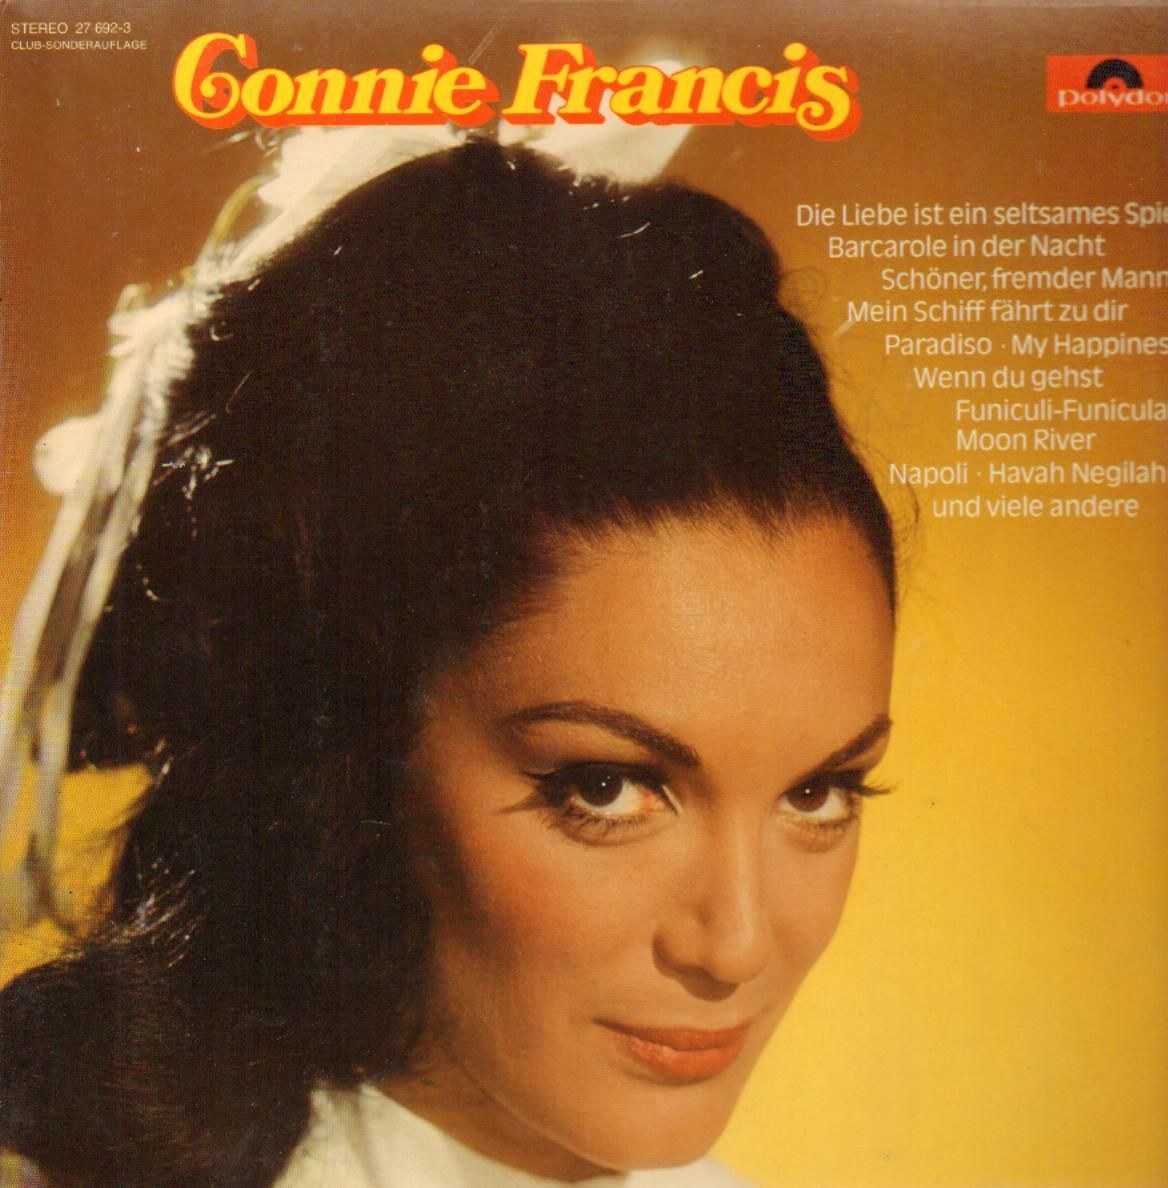 Images Of Connie Francis Connie Francis Connie Francis